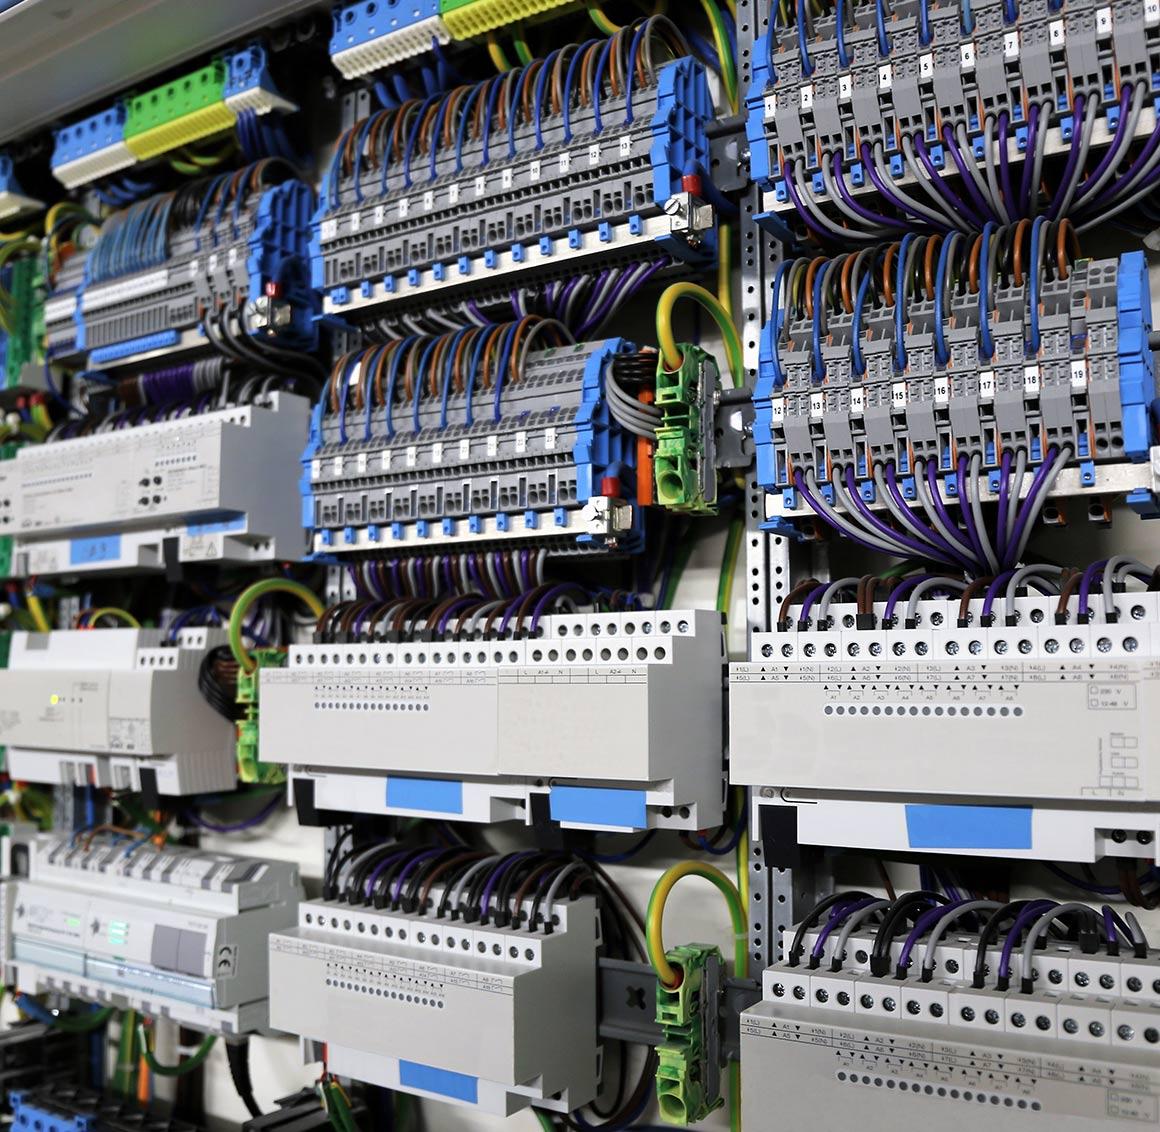 shutterstock.com - Palatinate Stock